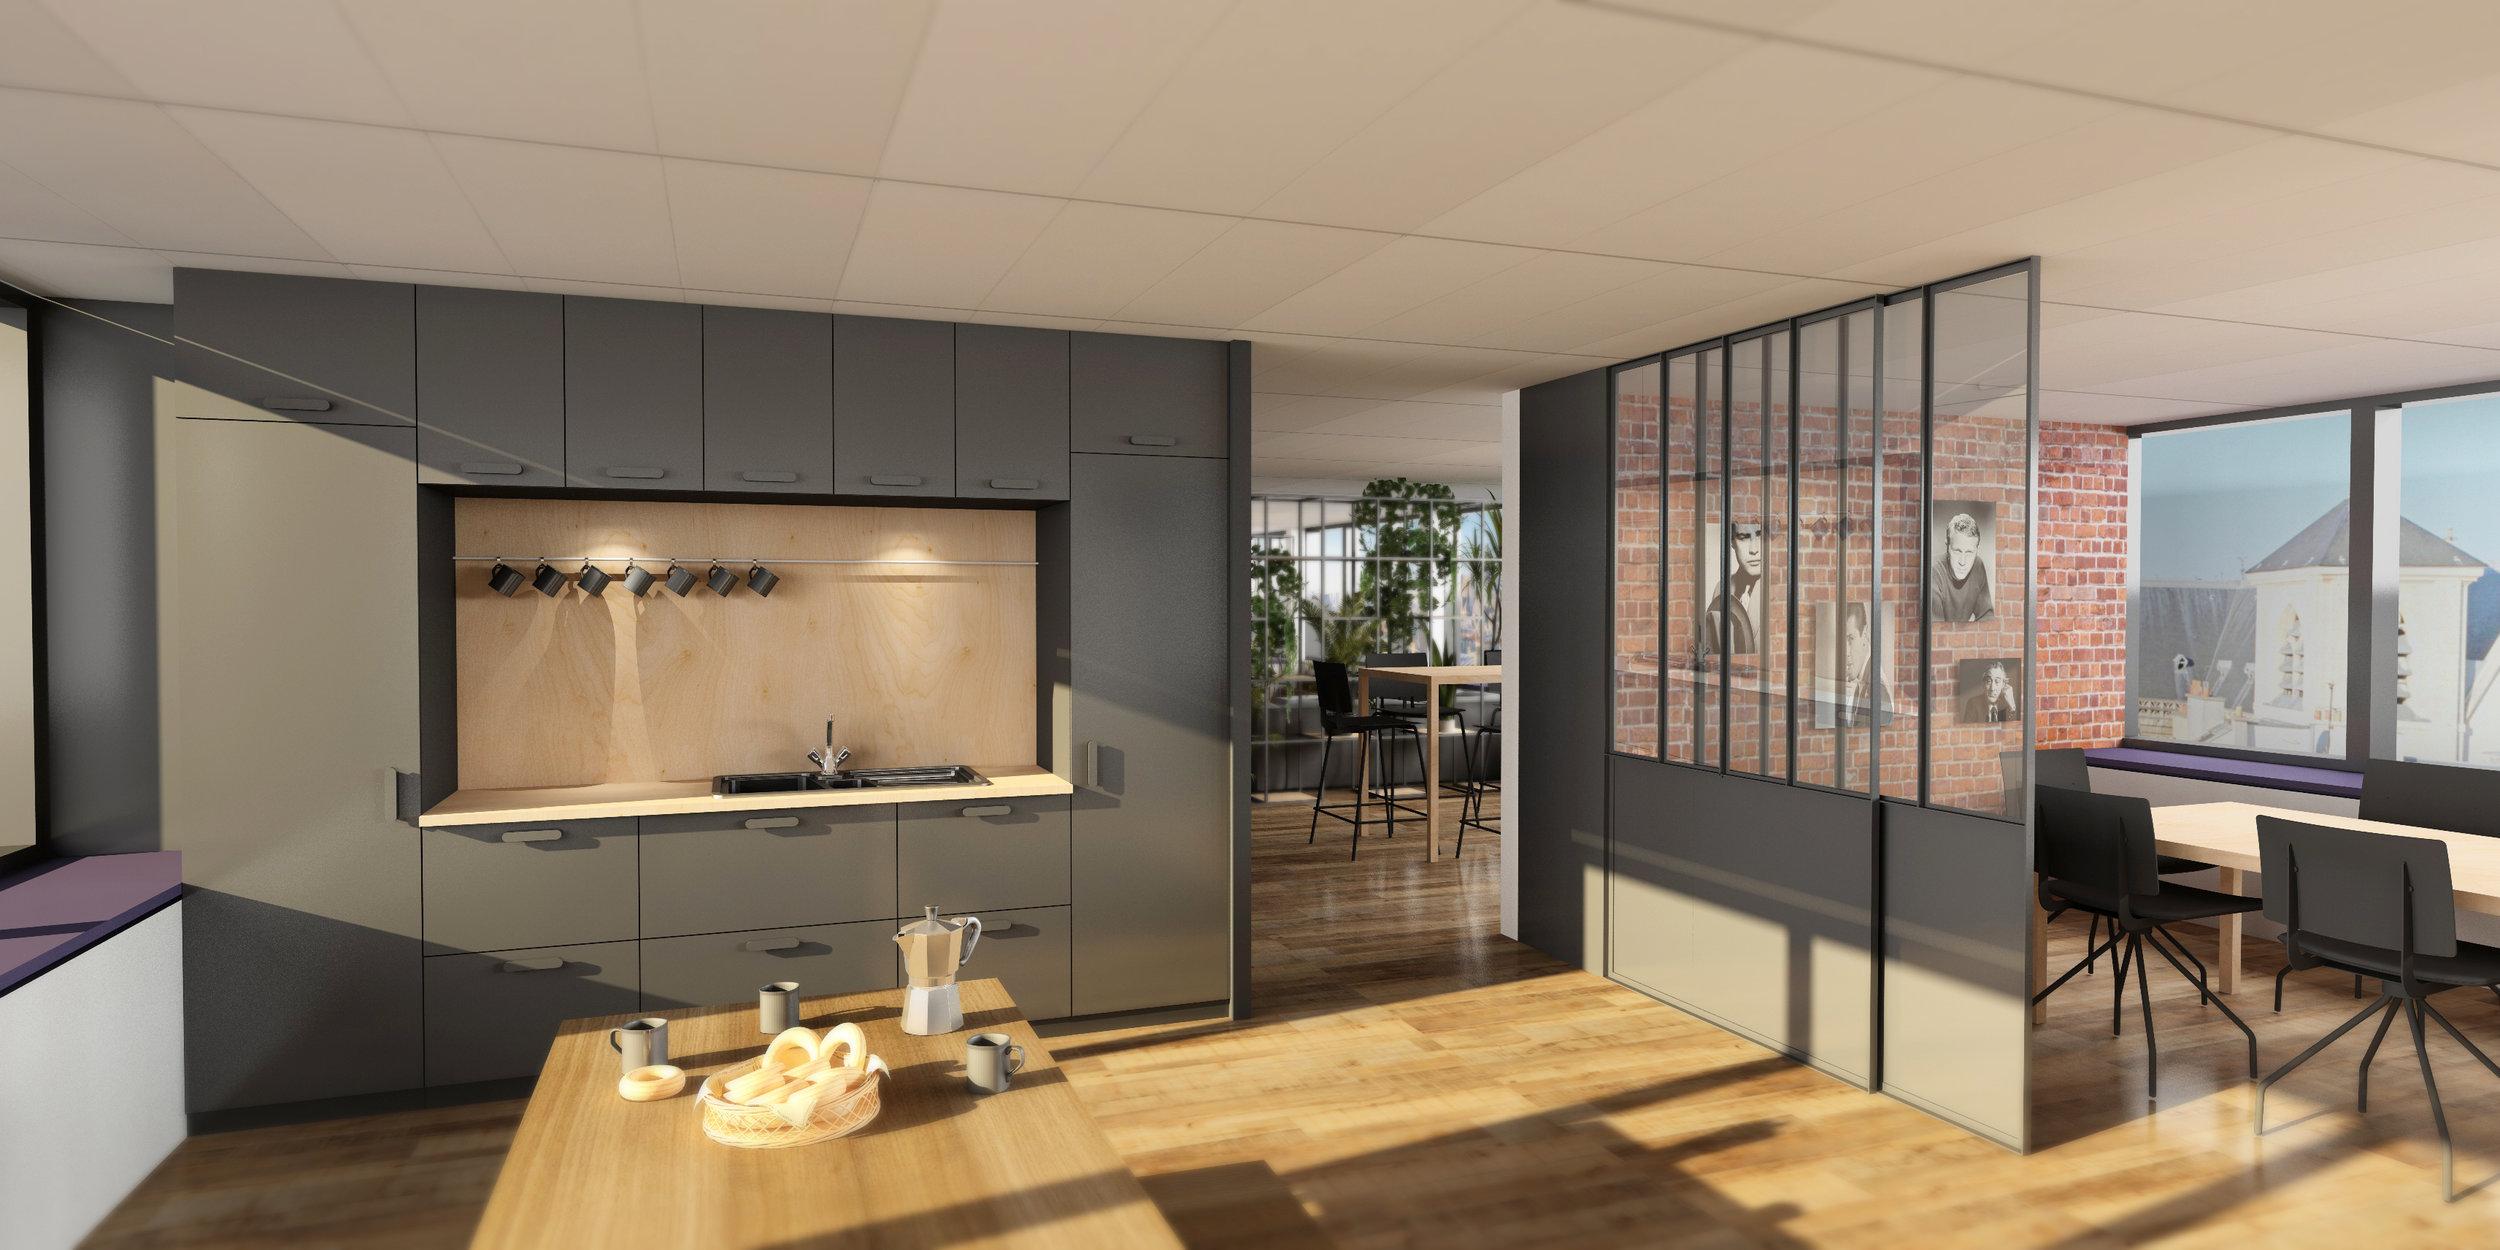 adv studio - nicolas vade - architecture interieur -lagardere 3.jpg